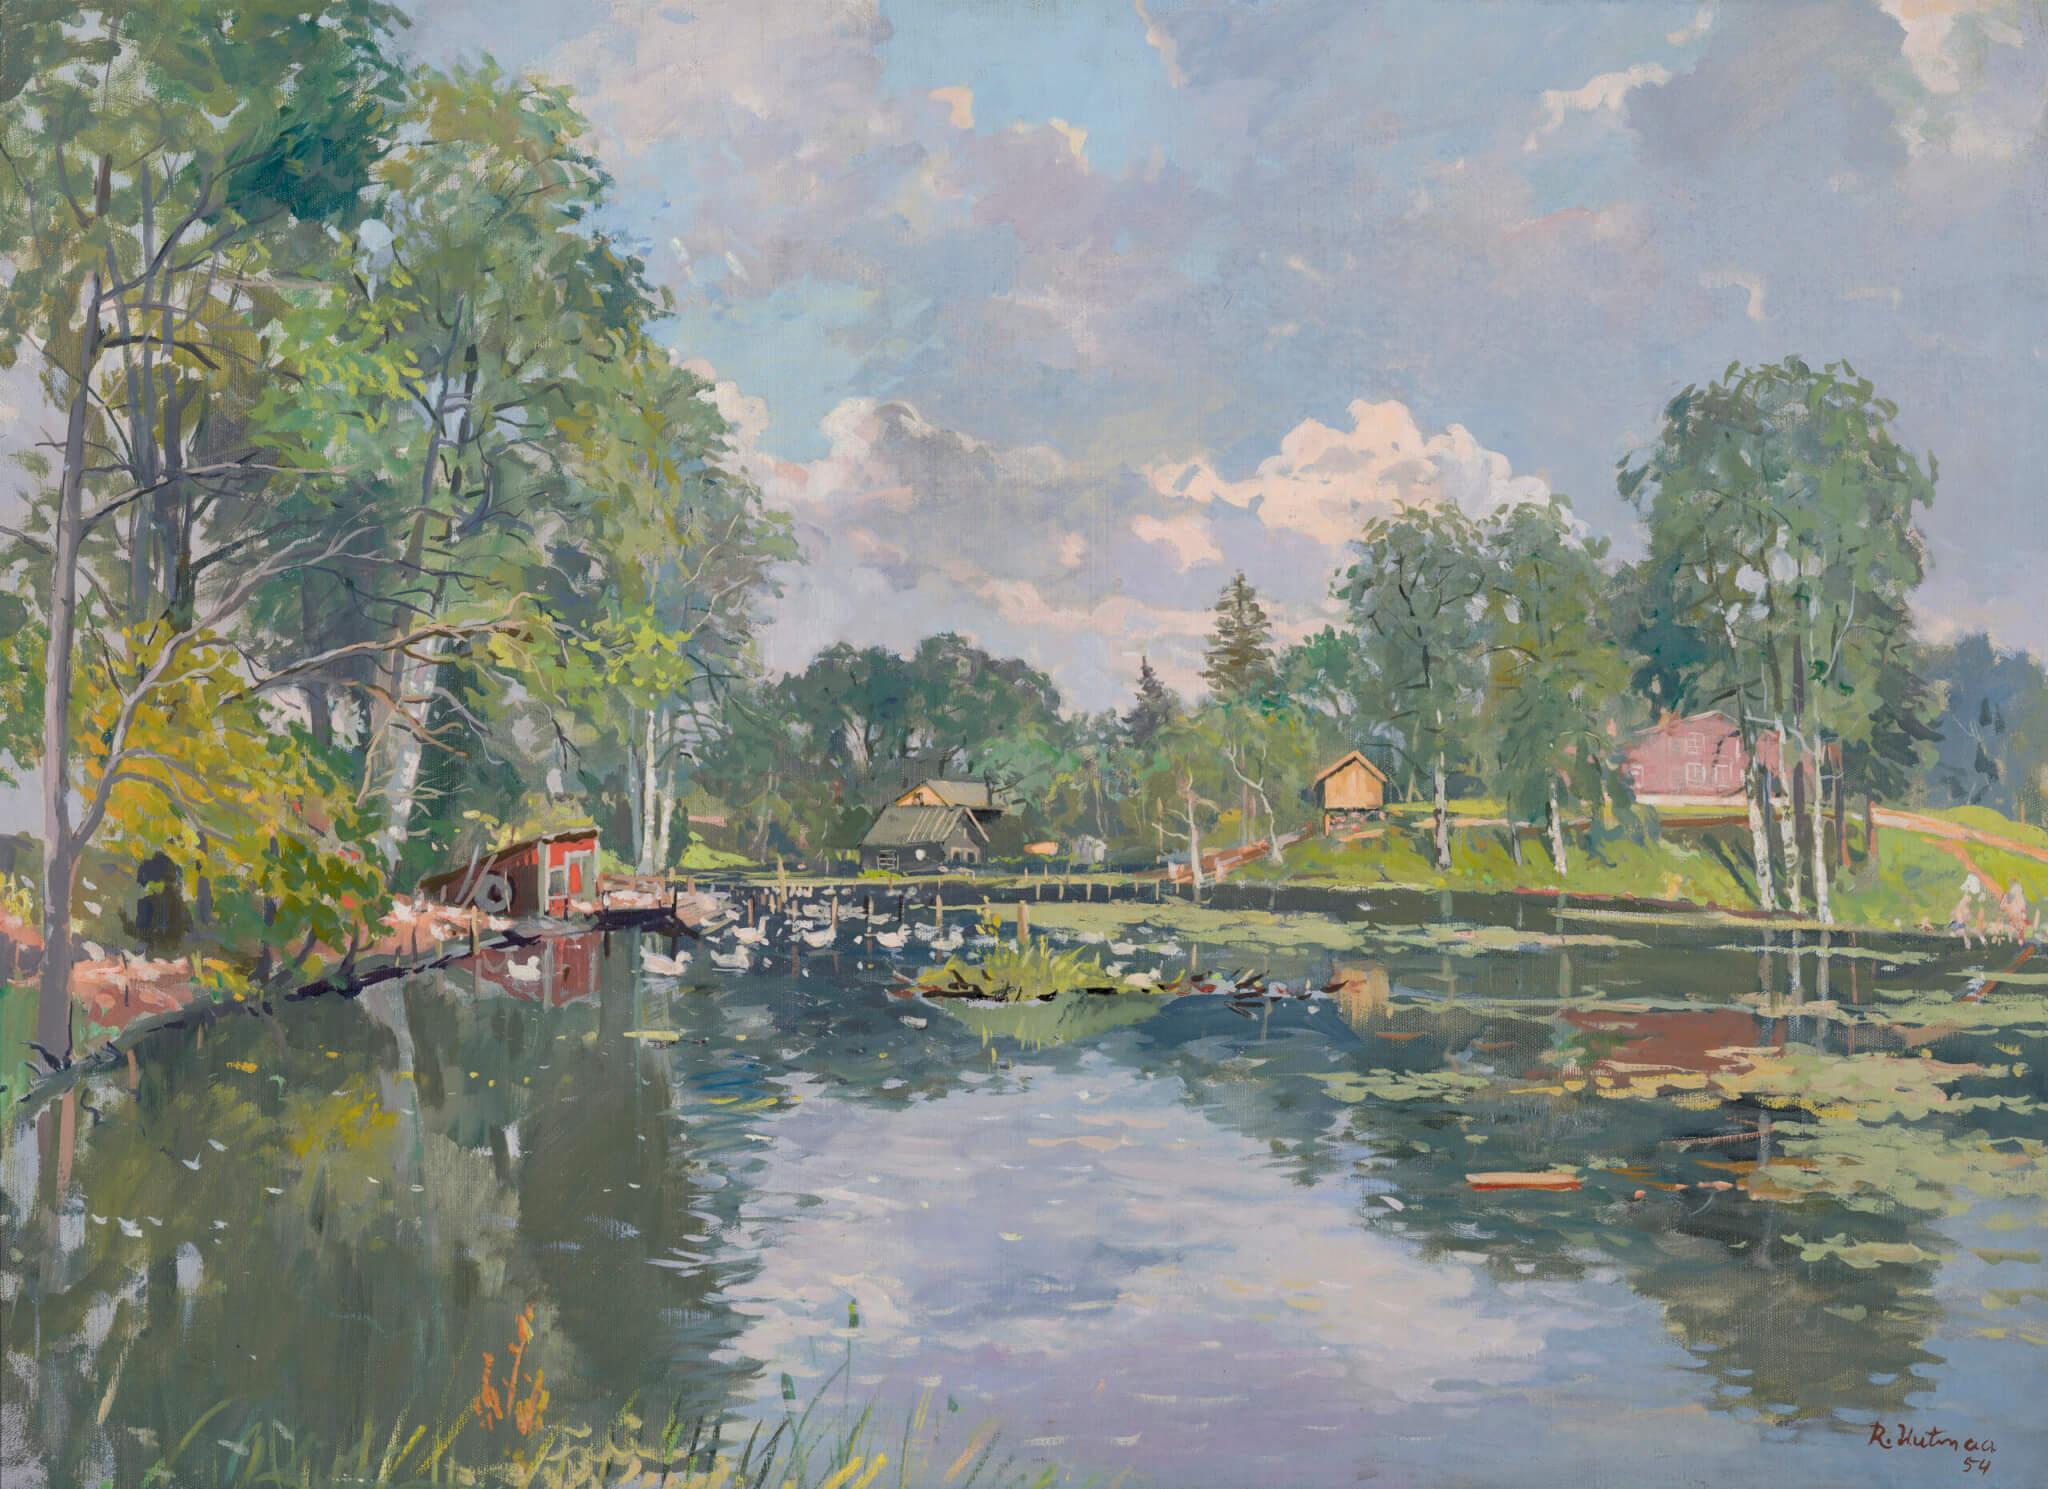 Richard-Uutmaa-kunstinäitus-Allee-galerii-Tallinnas-Kurtna-järv